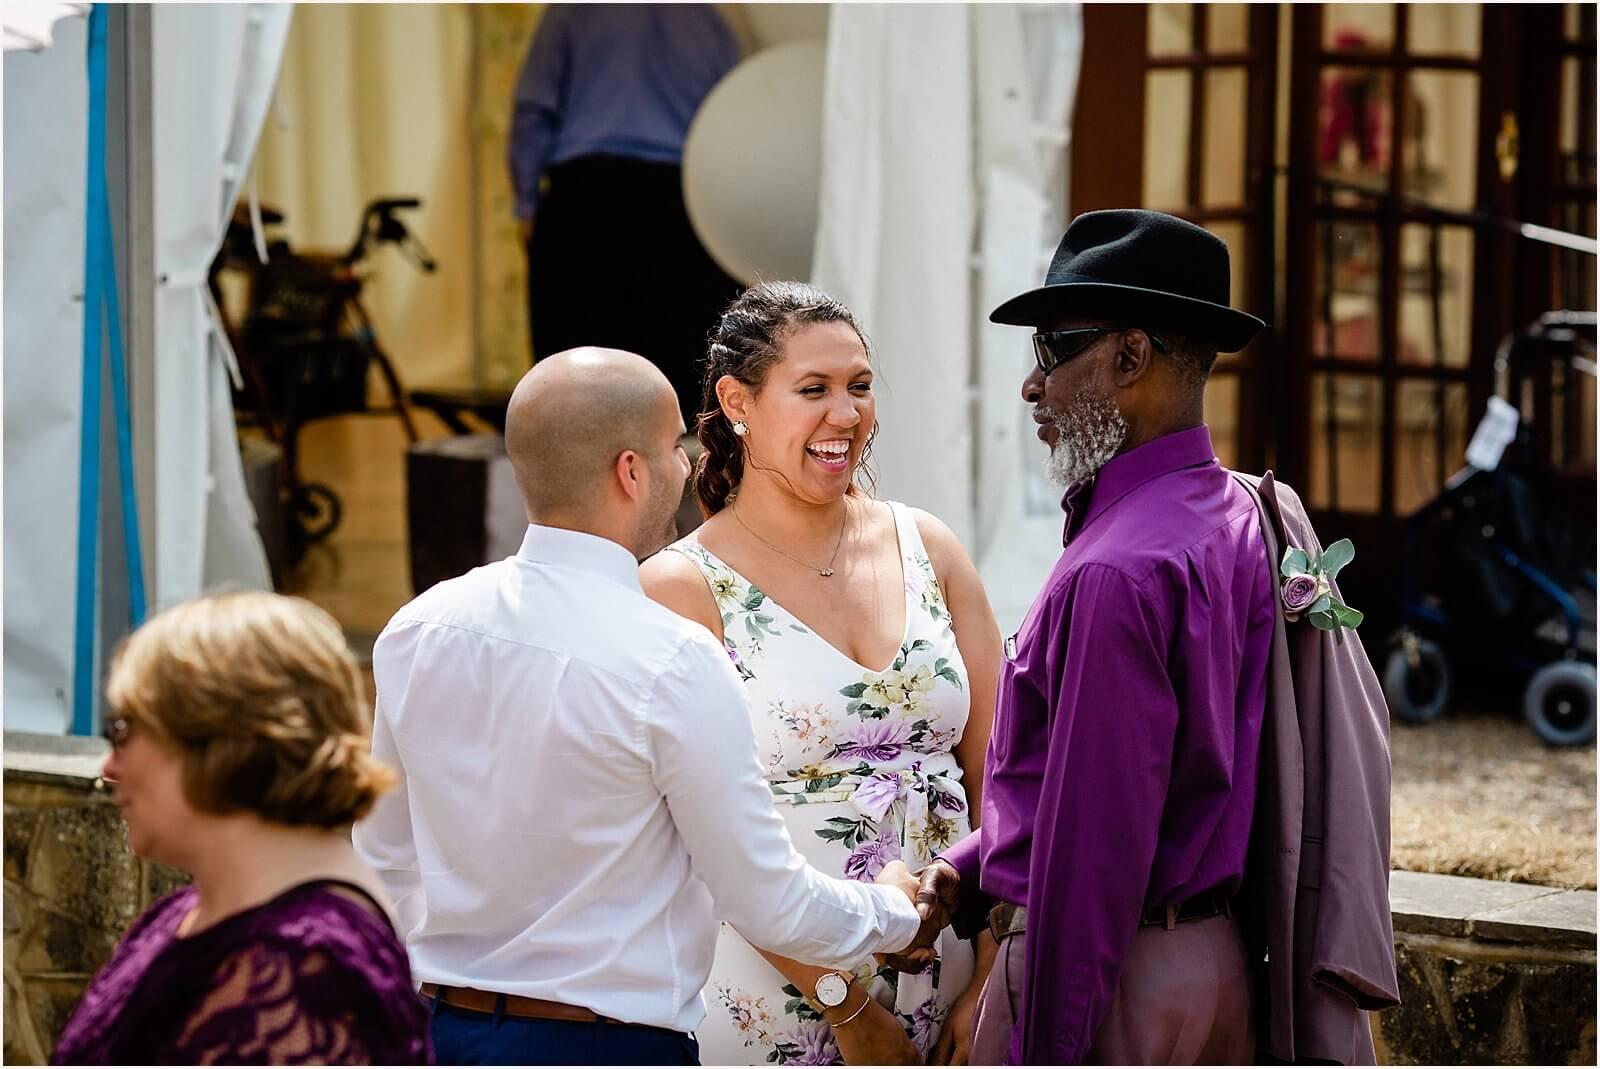 Swallows Oast Wedding - Jakki + Luke's barn wedding photography 31